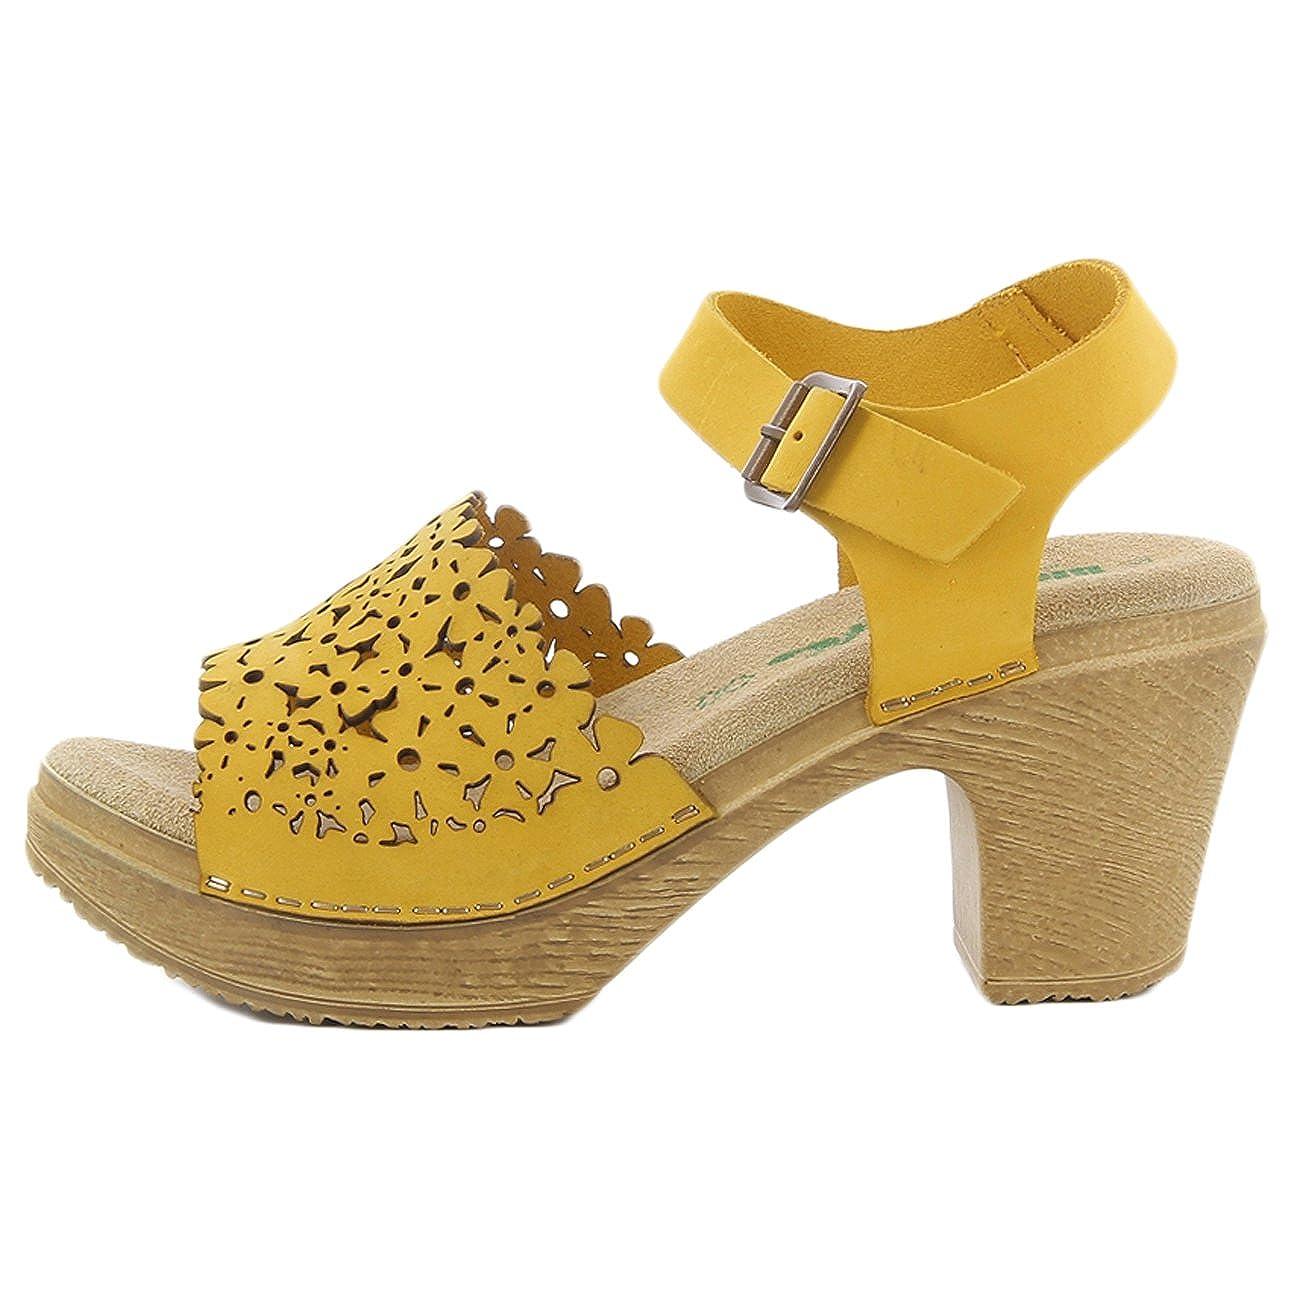 Bionatura memory foam sandals 40